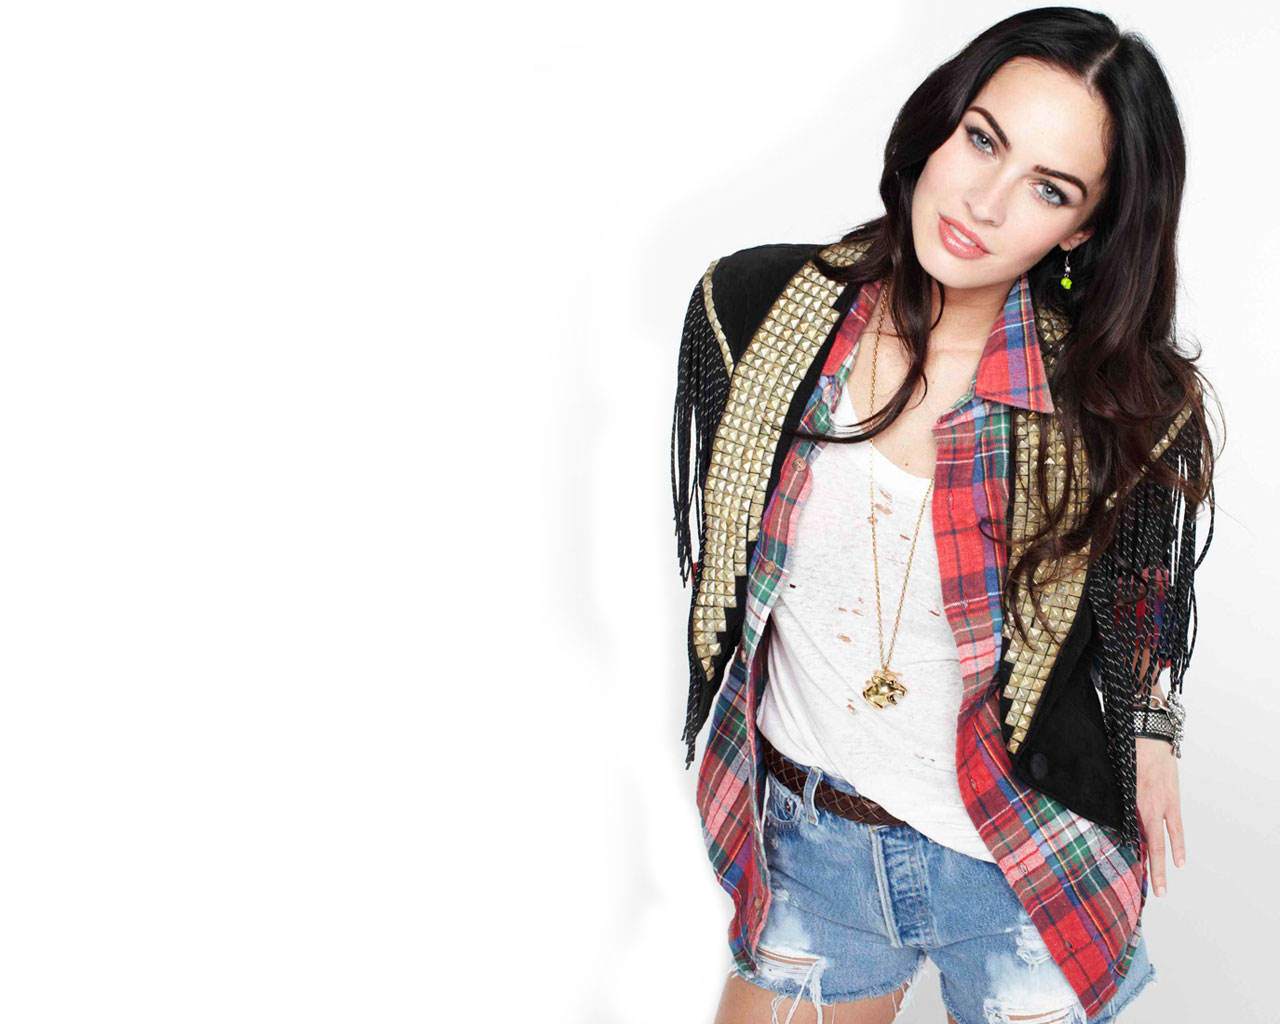 HD Wallpapers Megan Fox 2